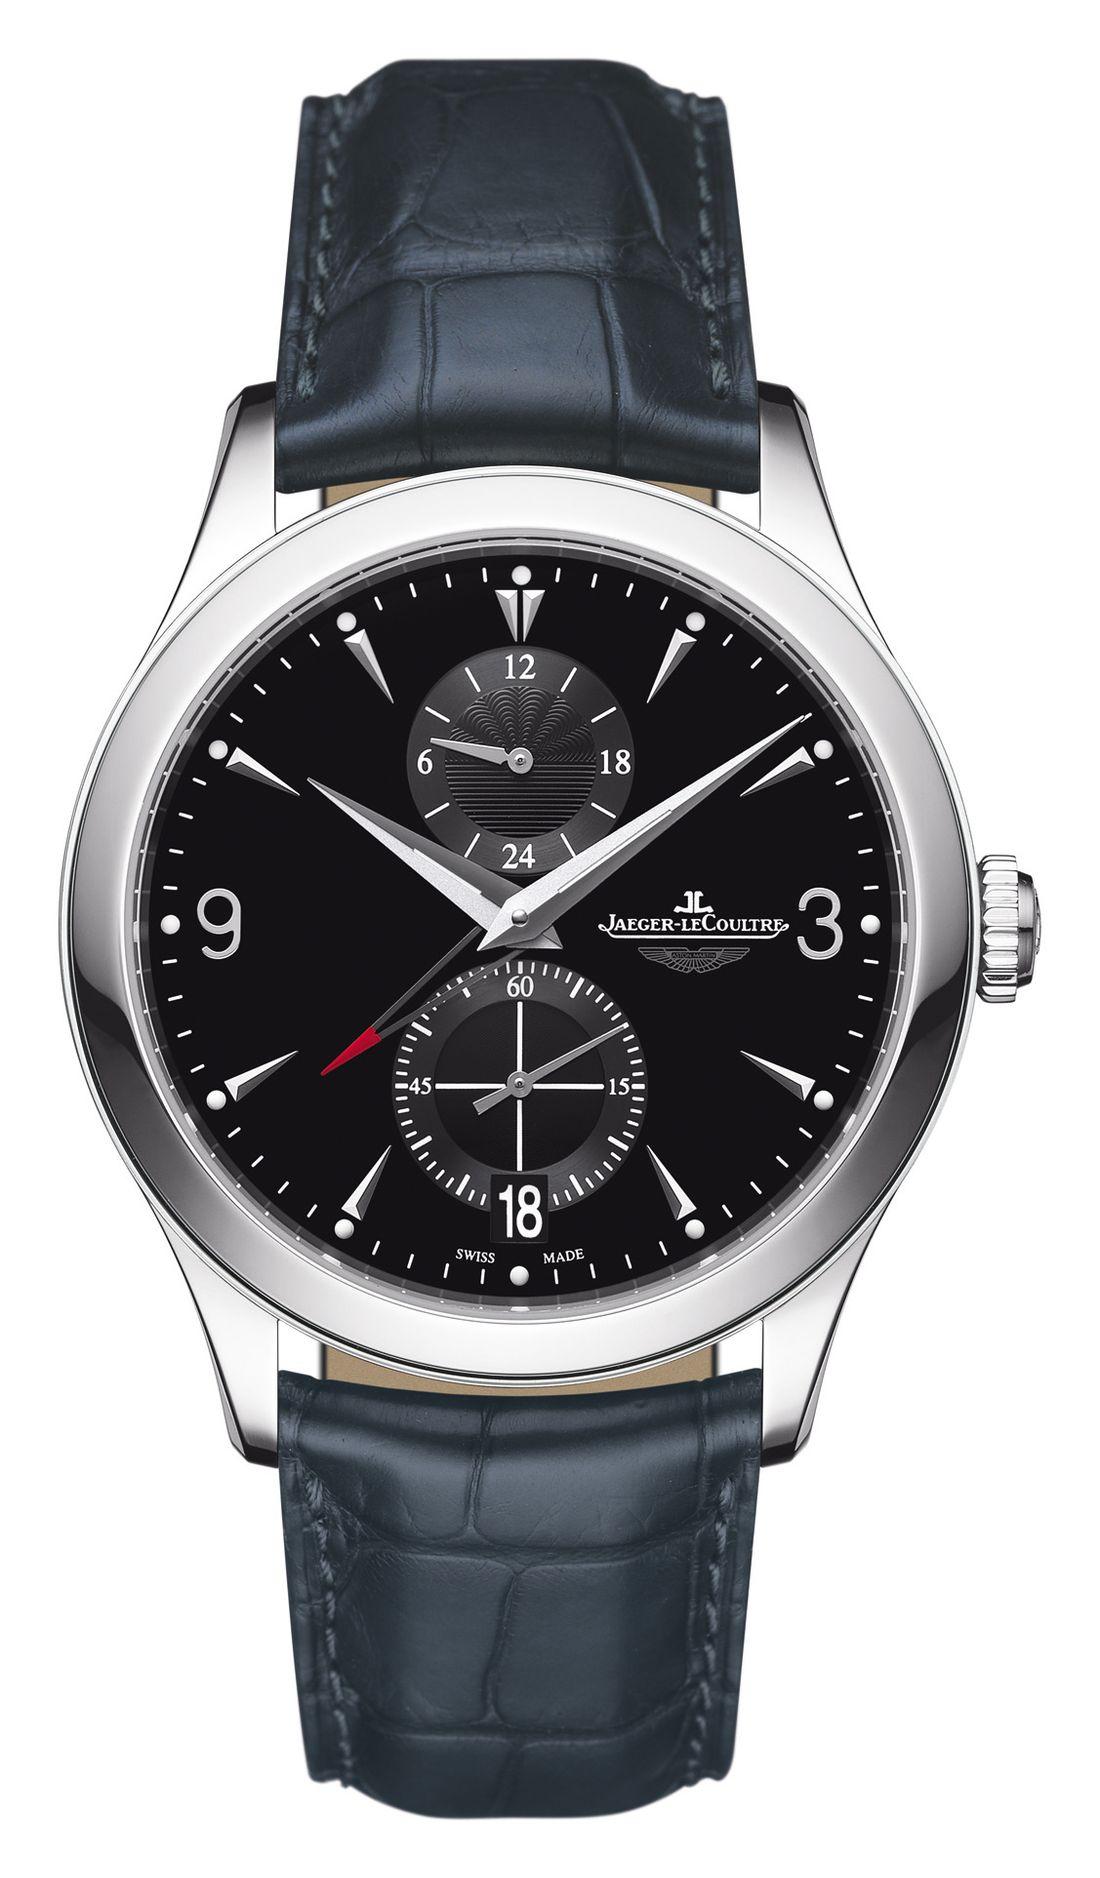 aston-martin-jaeger-lecoultre-montre_10